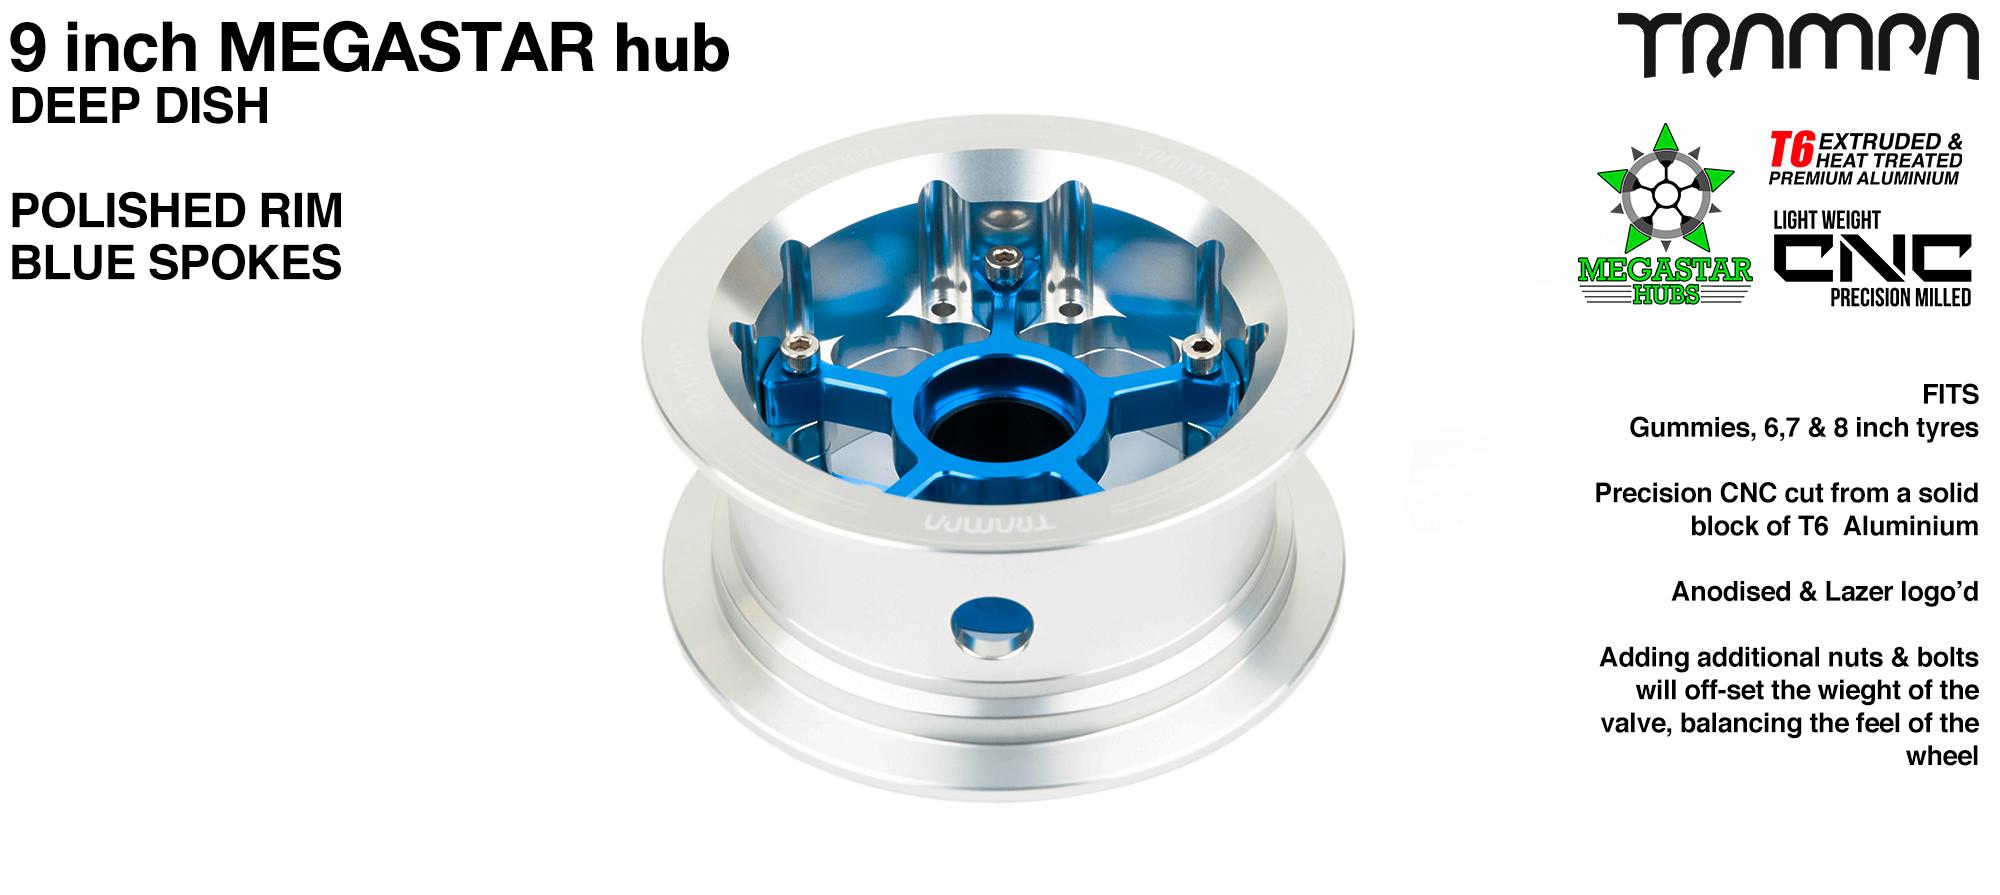 9 Inch DEEP DISH MEGASTAR Hub - SILVER Rim with BLUE Spokes